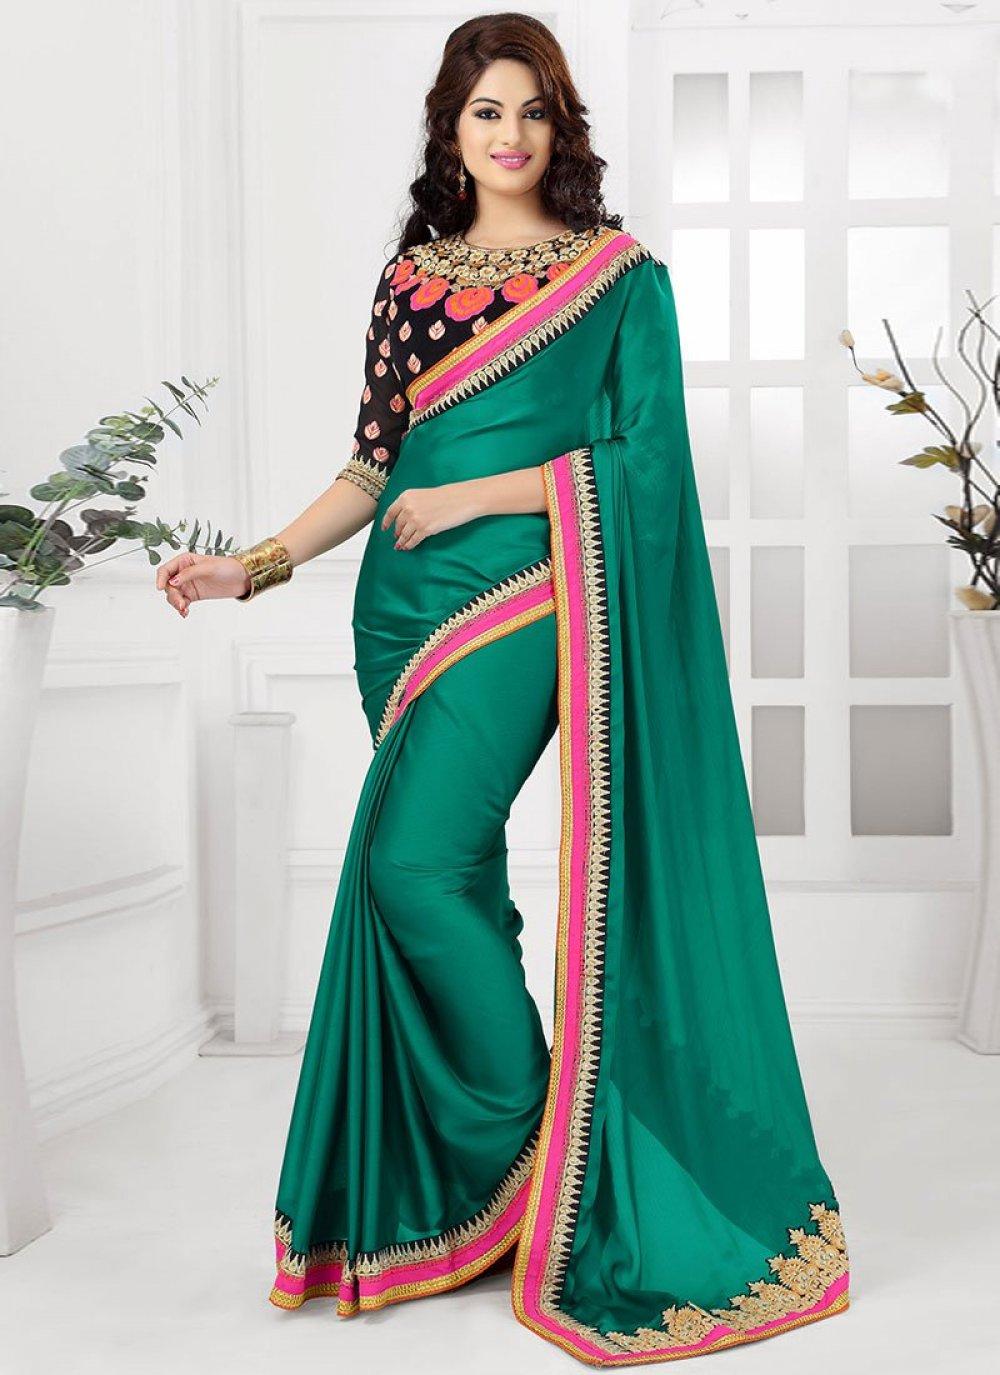 Green Satin Chiffon Party Wear Saree